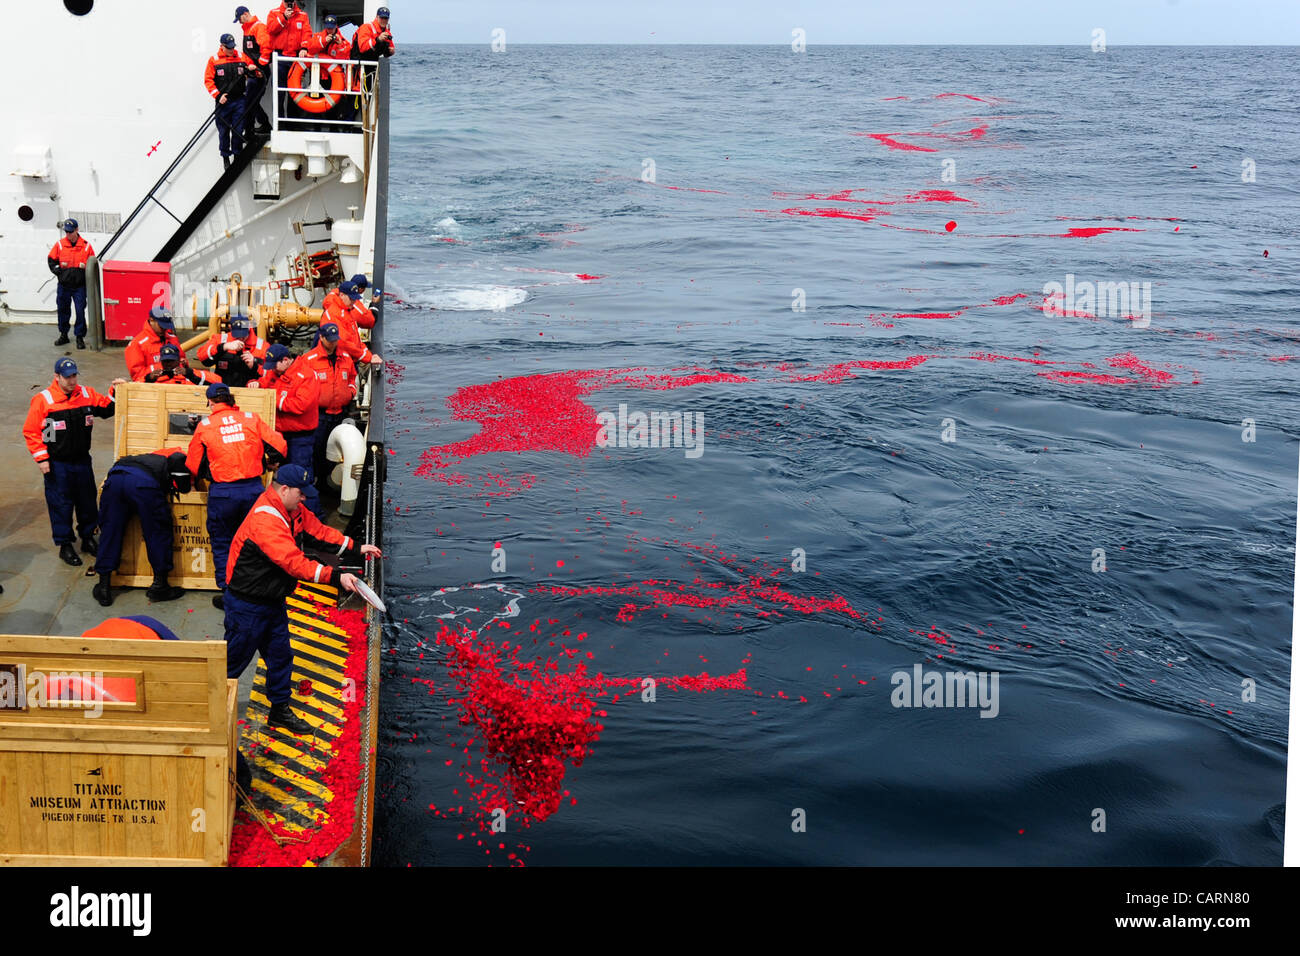 NORTH ATLANTIC – U.S. Coast Guard Cutter Juniper crewmembers lay 1.5 million dried rose petals over the RMS Titanic's - Stock Image